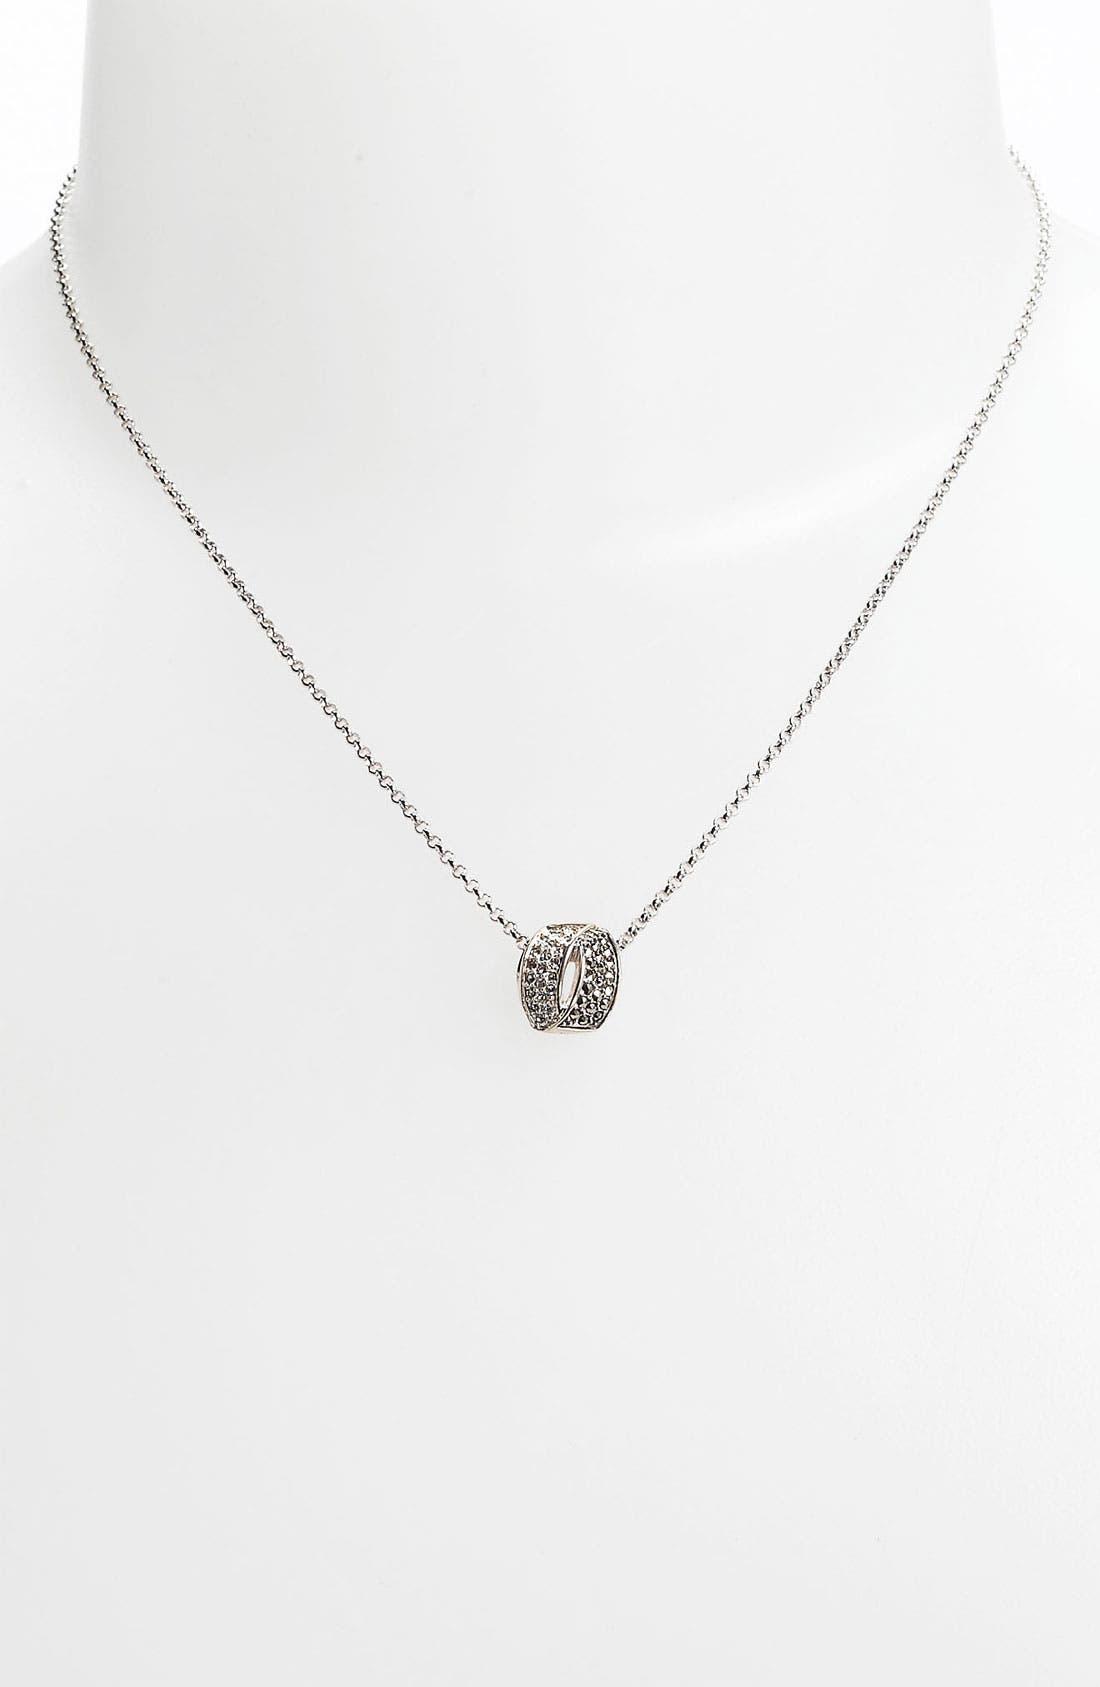 Alternate Image 1 Selected - Judith Jack 'Crystal Glitz' Pendant Necklace